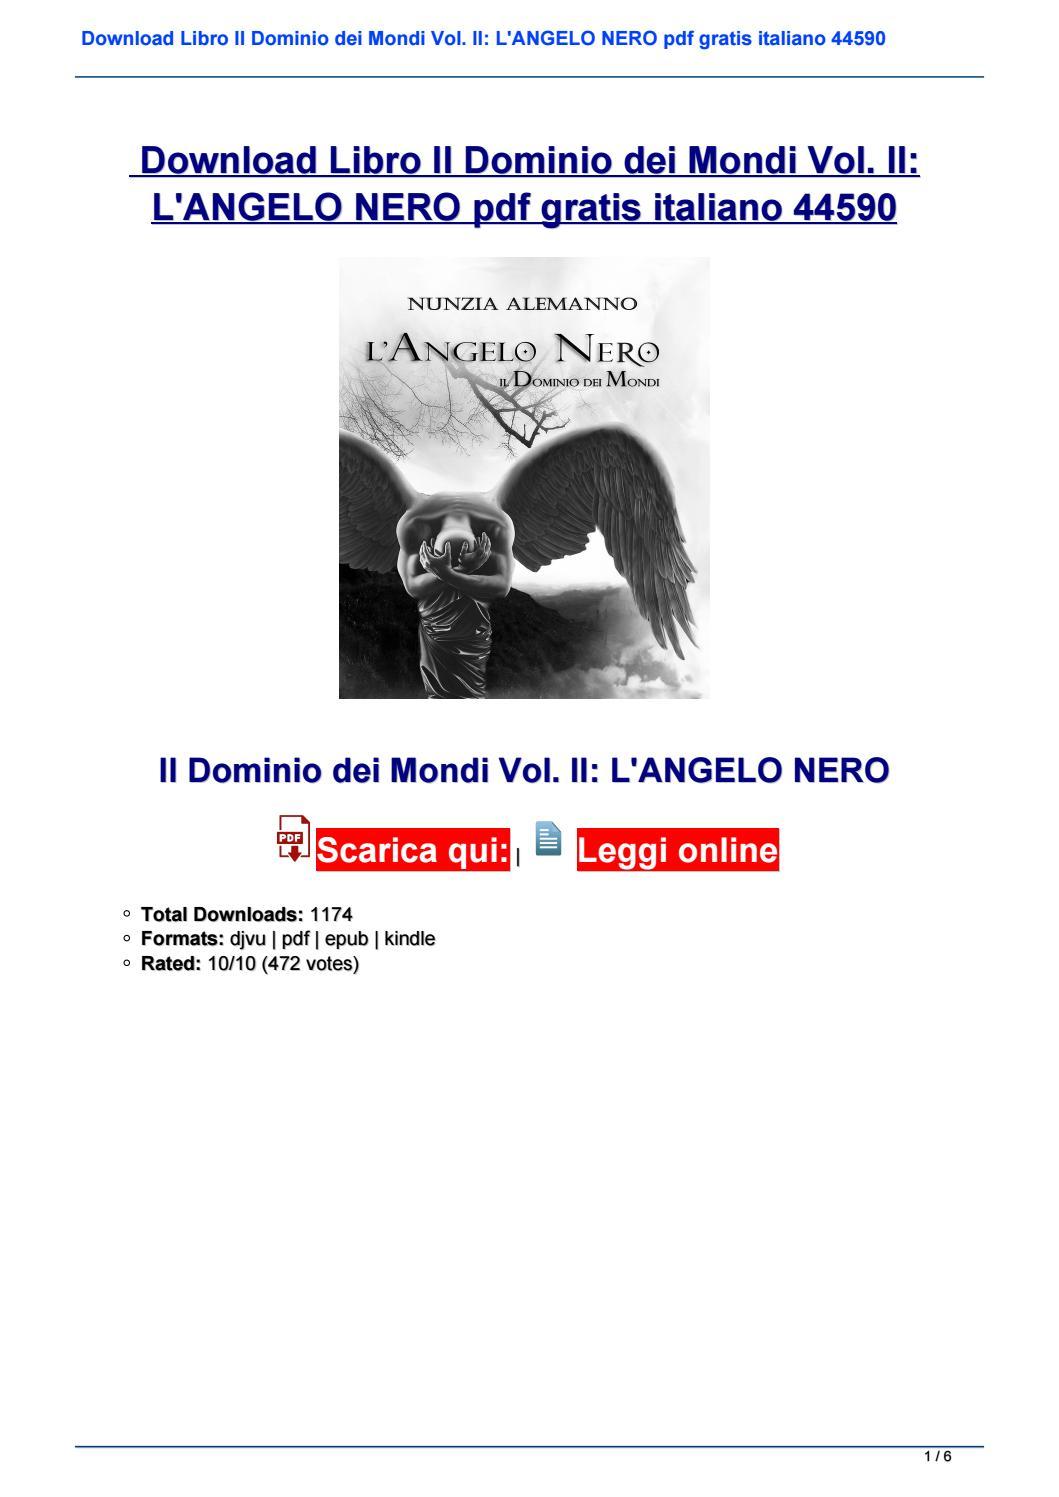 Come scaricare ebook gratis download ita pdf, epub, kindle youtube.